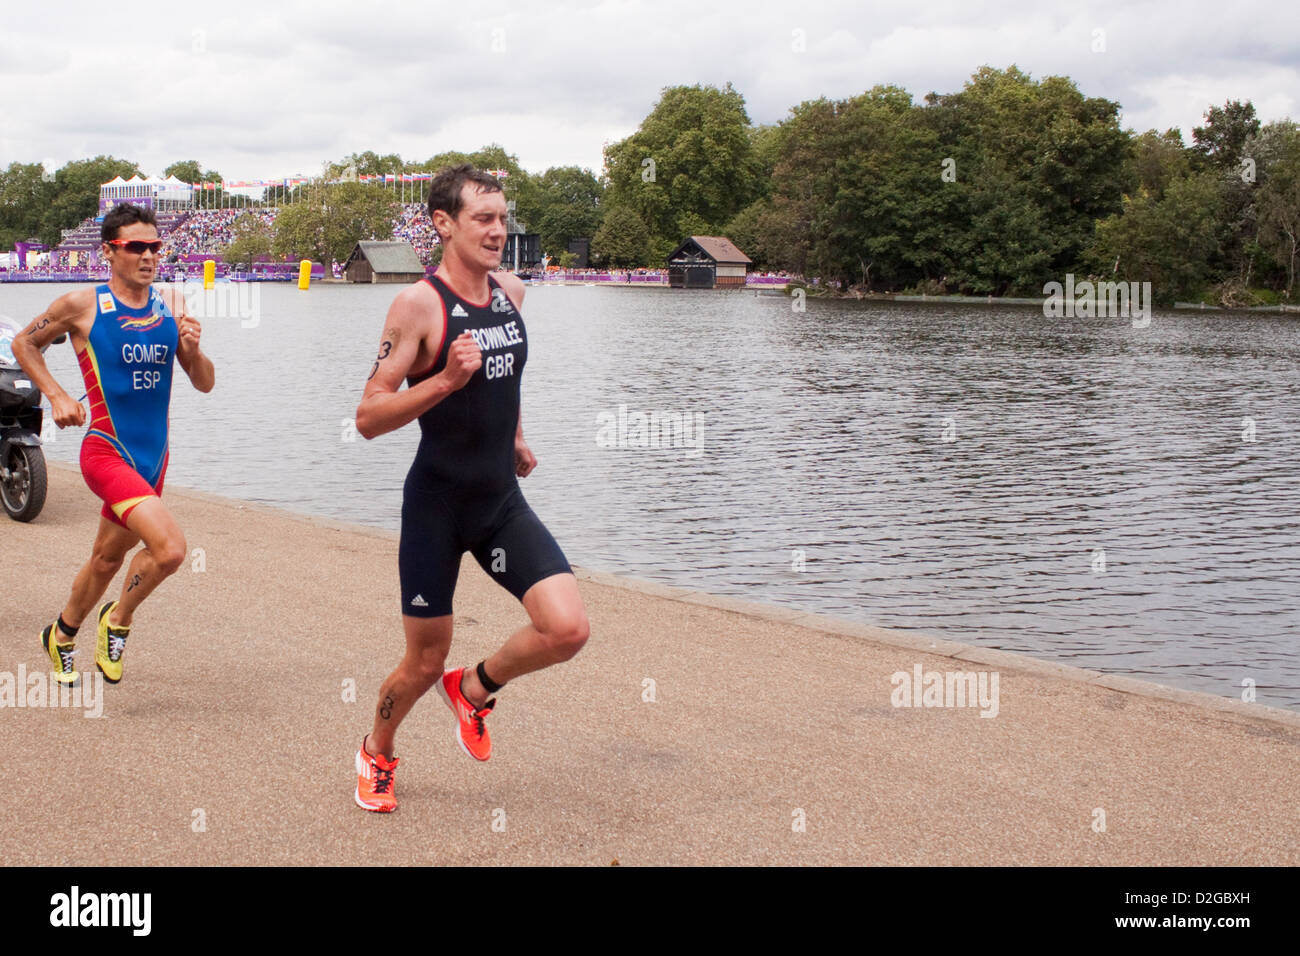 Alistair Brownlee and Javier Gomez running in Olympic Men's Triathlon 2012, in Hyde Park. - Stock Image